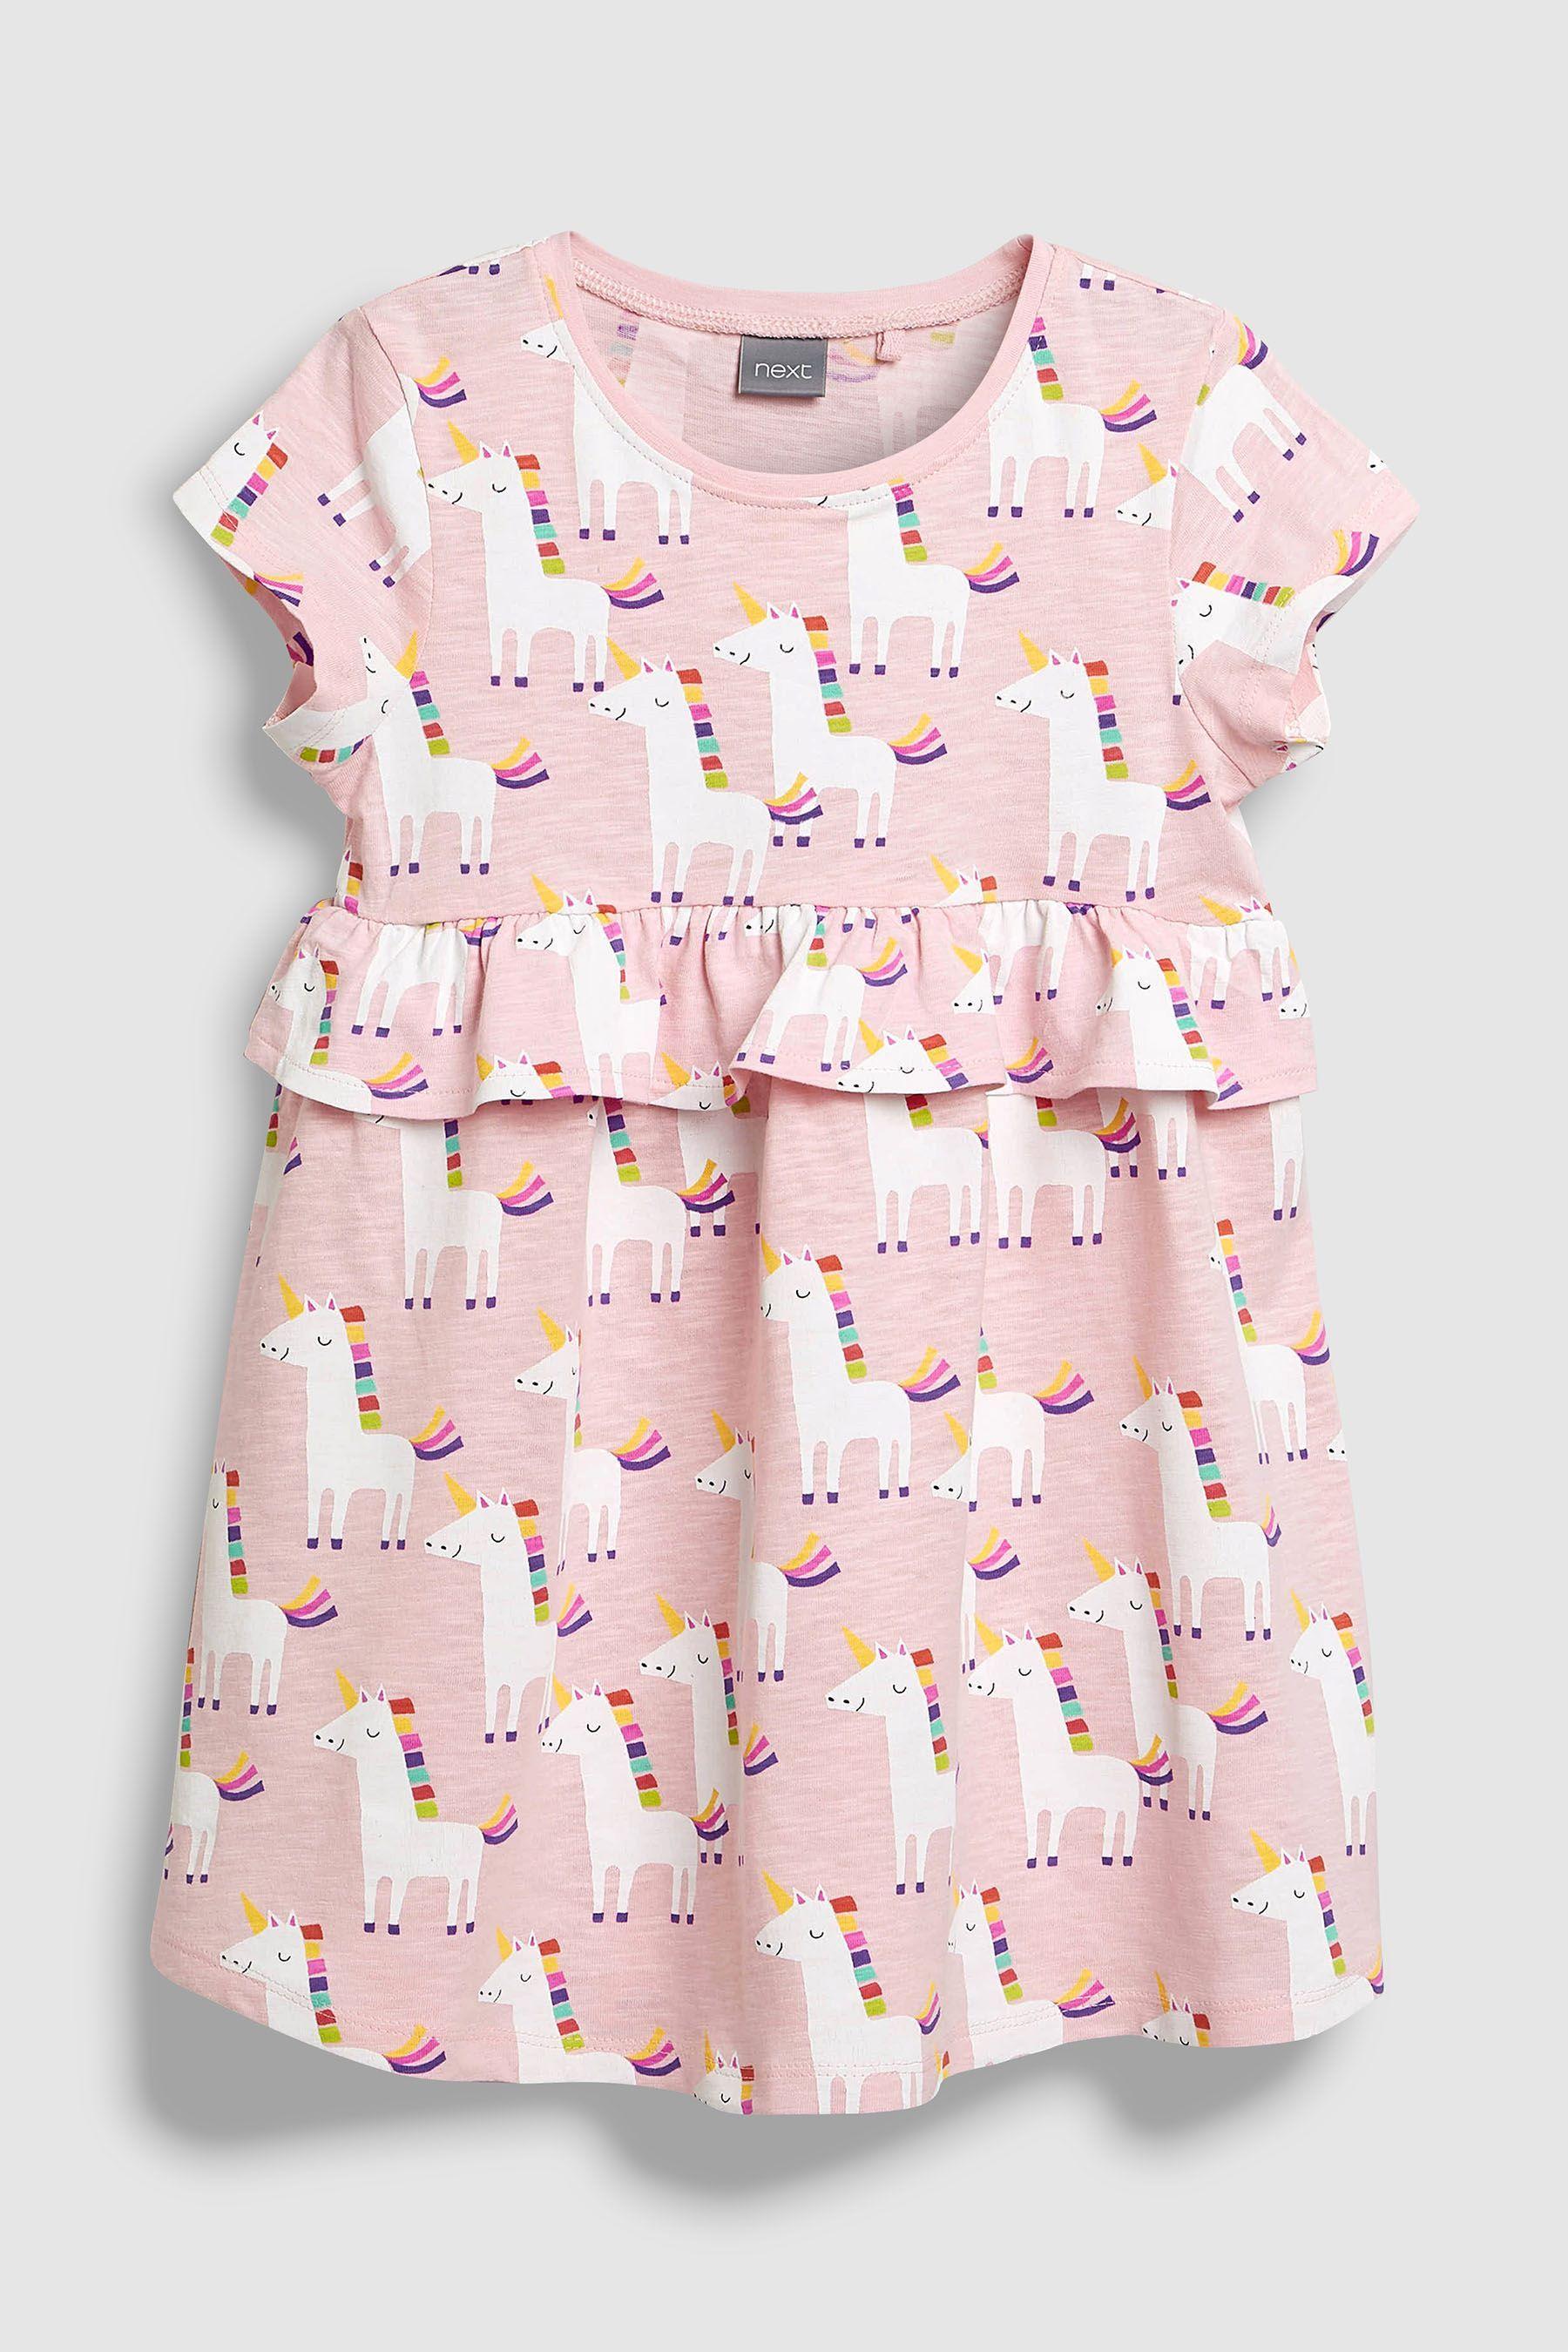 b421d084086f Girls Next Pink Unicorn Print Dress (3mths-6yrs) - Pink | Products ...